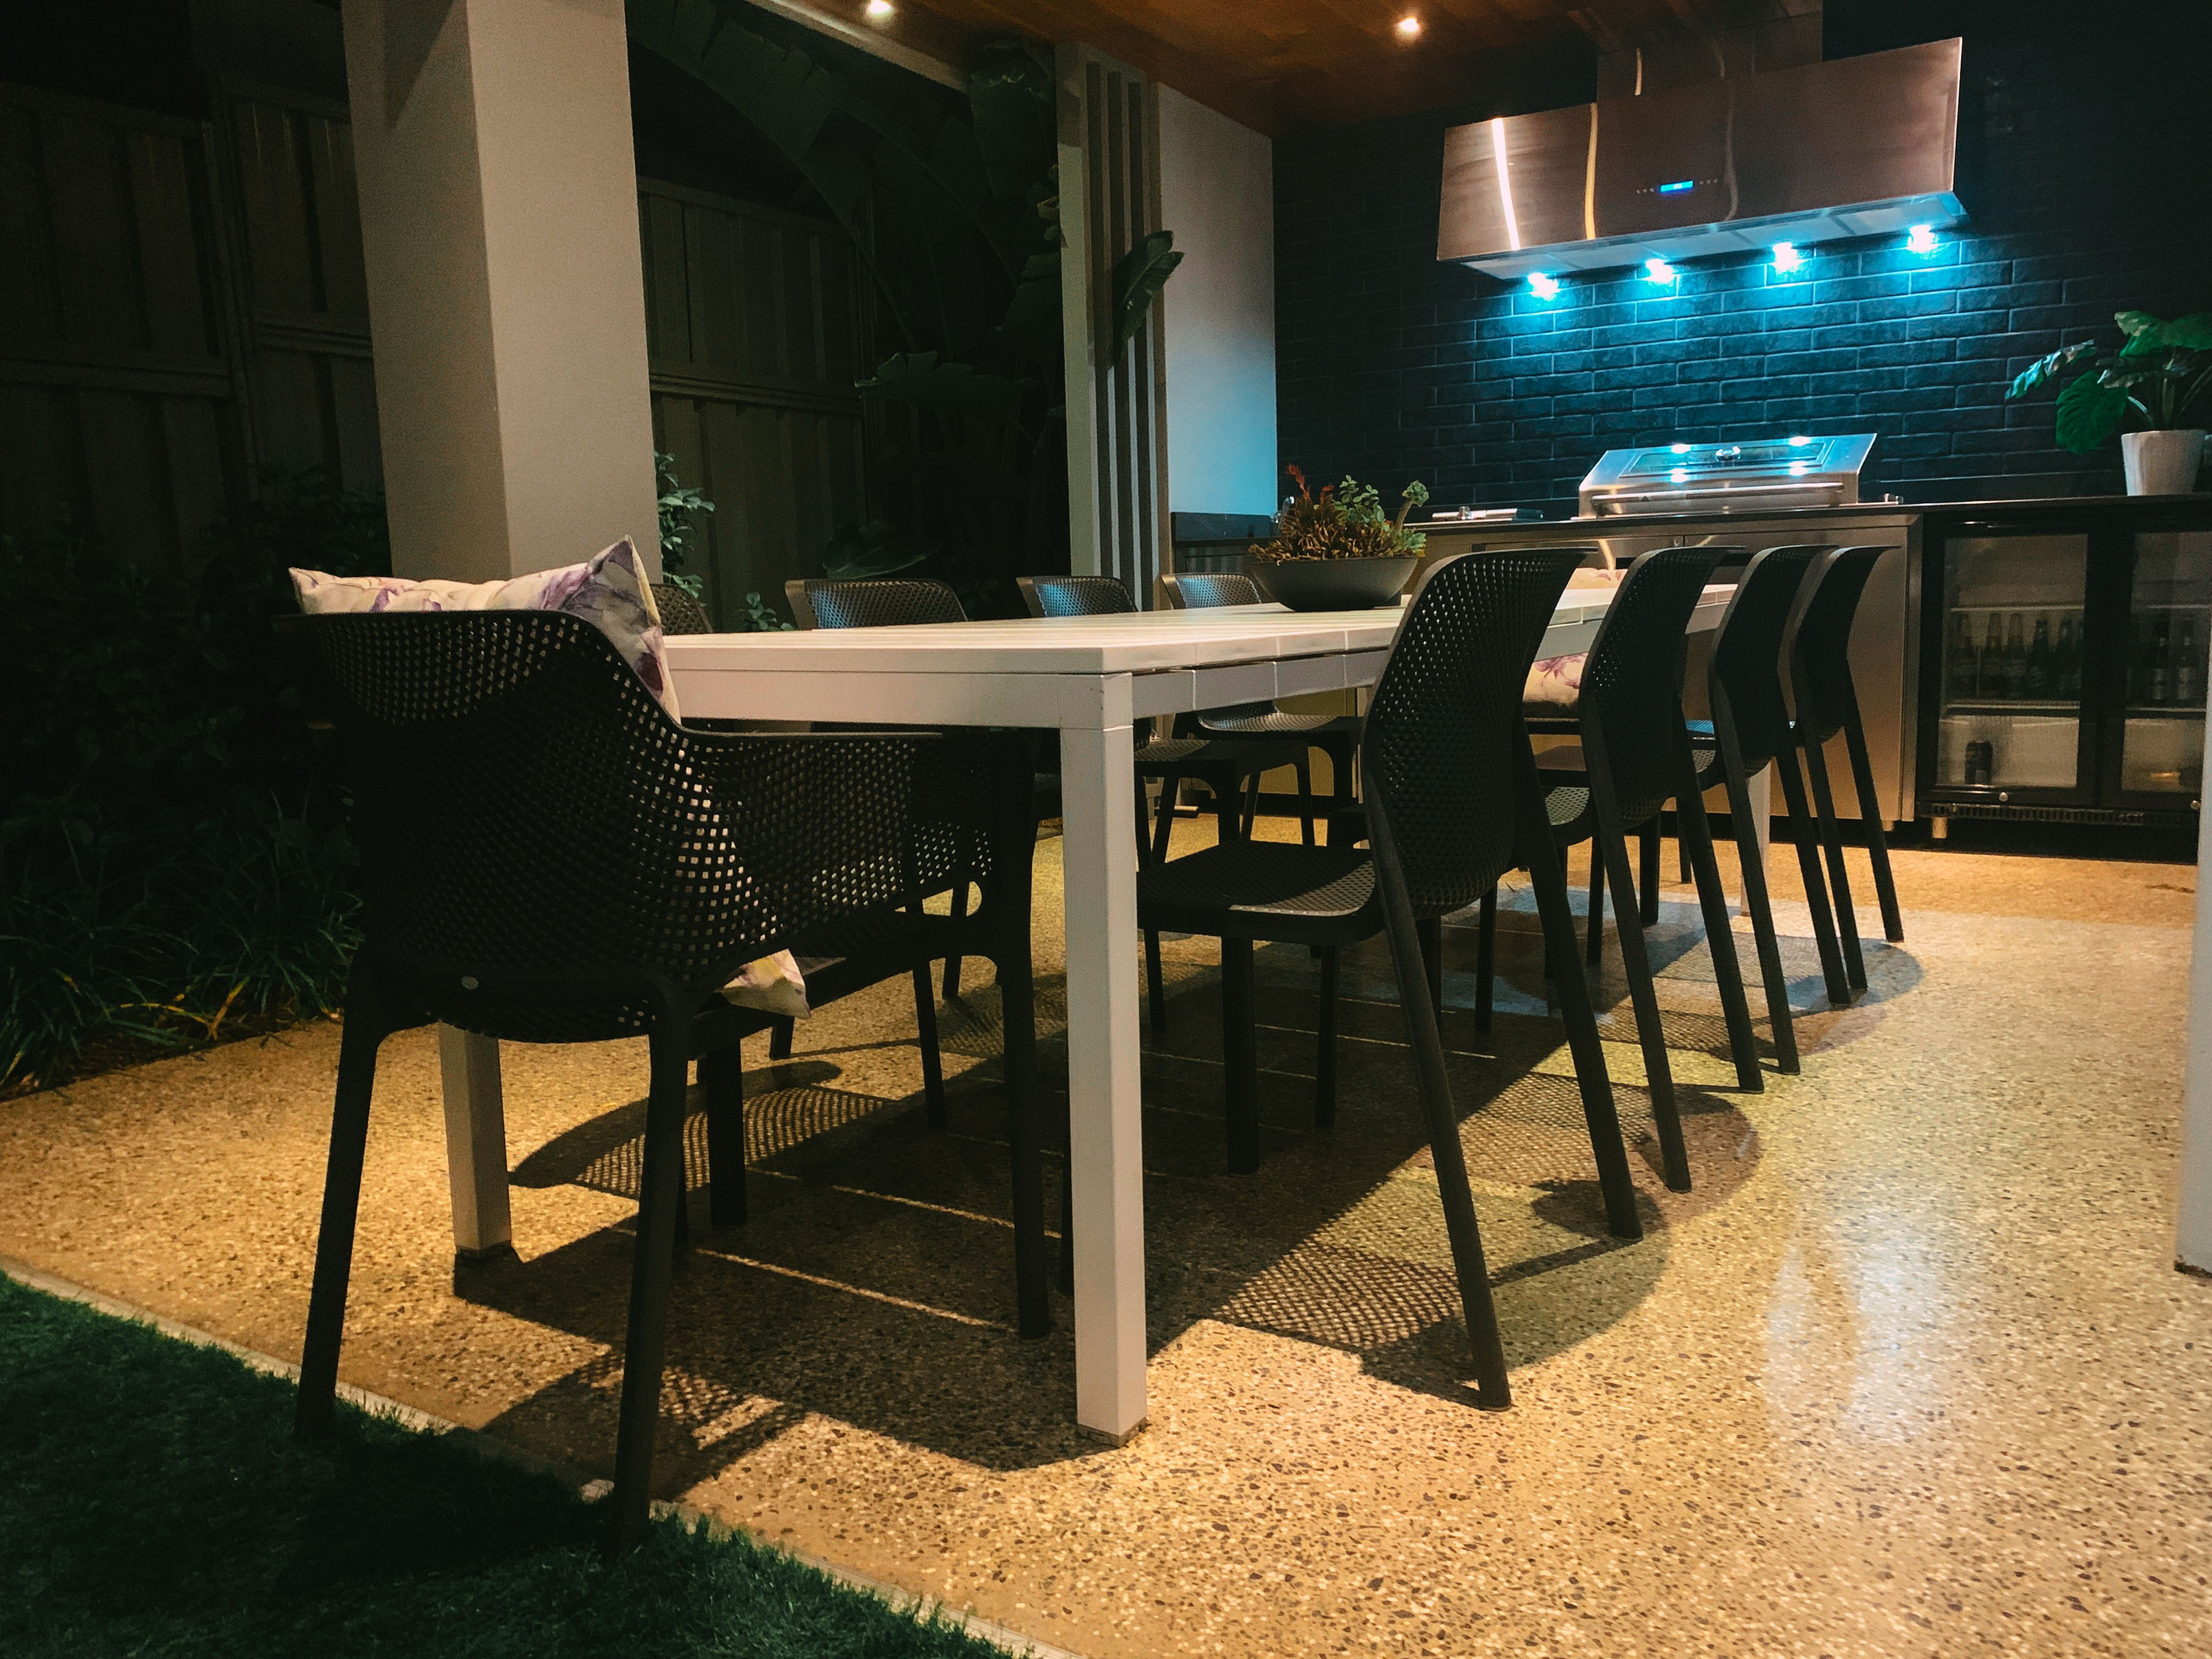 Nardi Bit Dining Set In 2020 Table, 11 Piece Dining Room Set